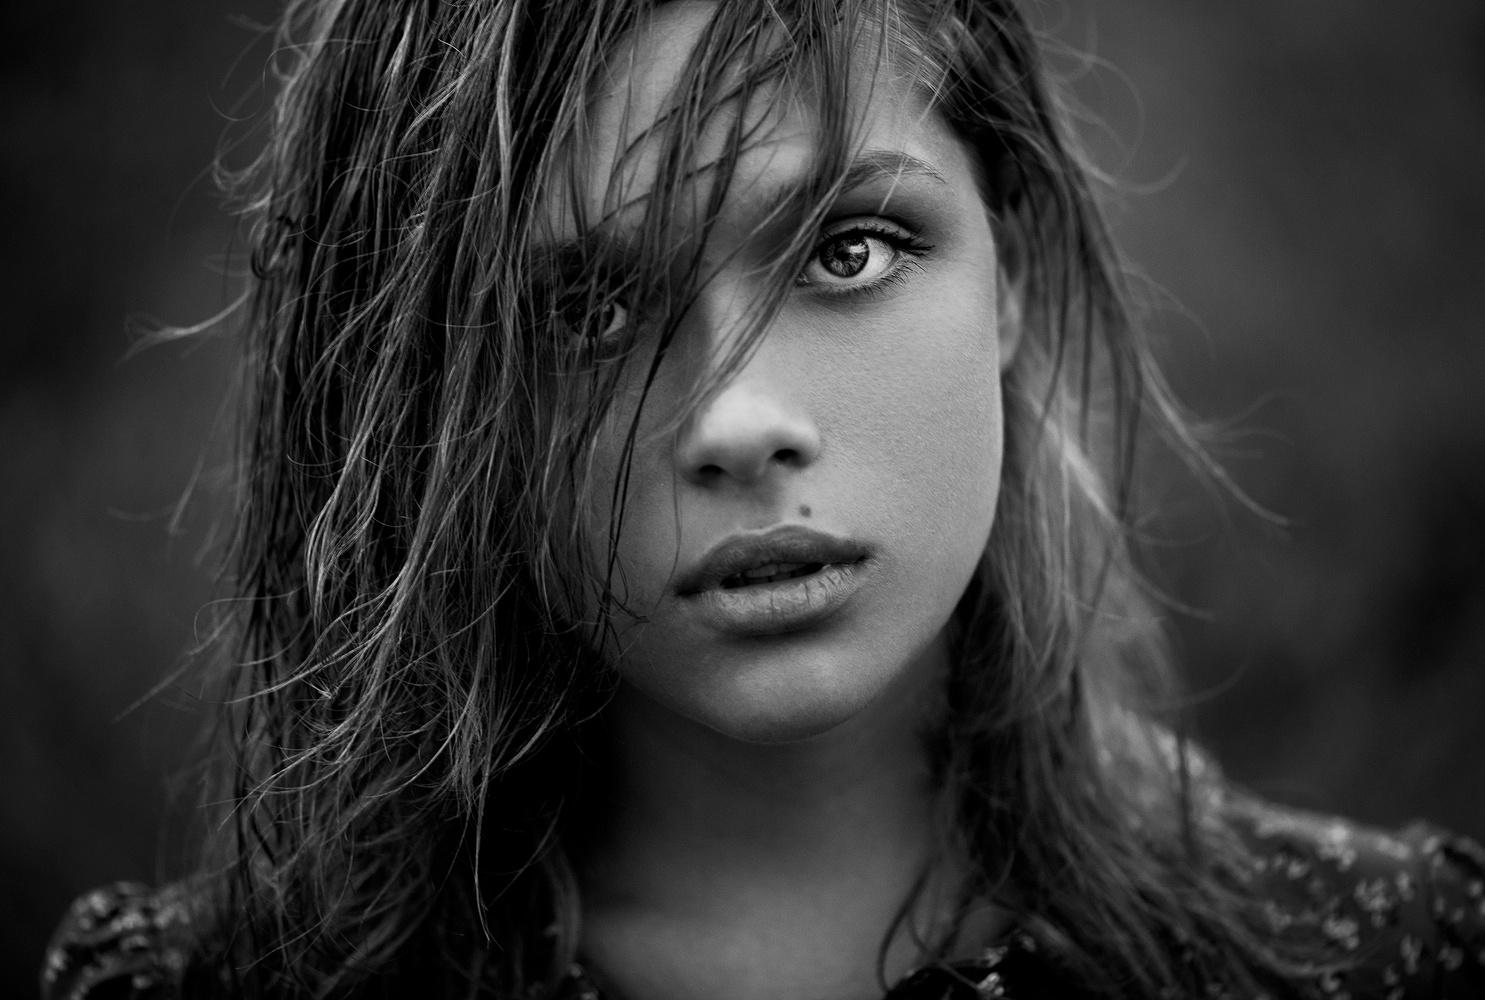 Elena by Ann Nevreva